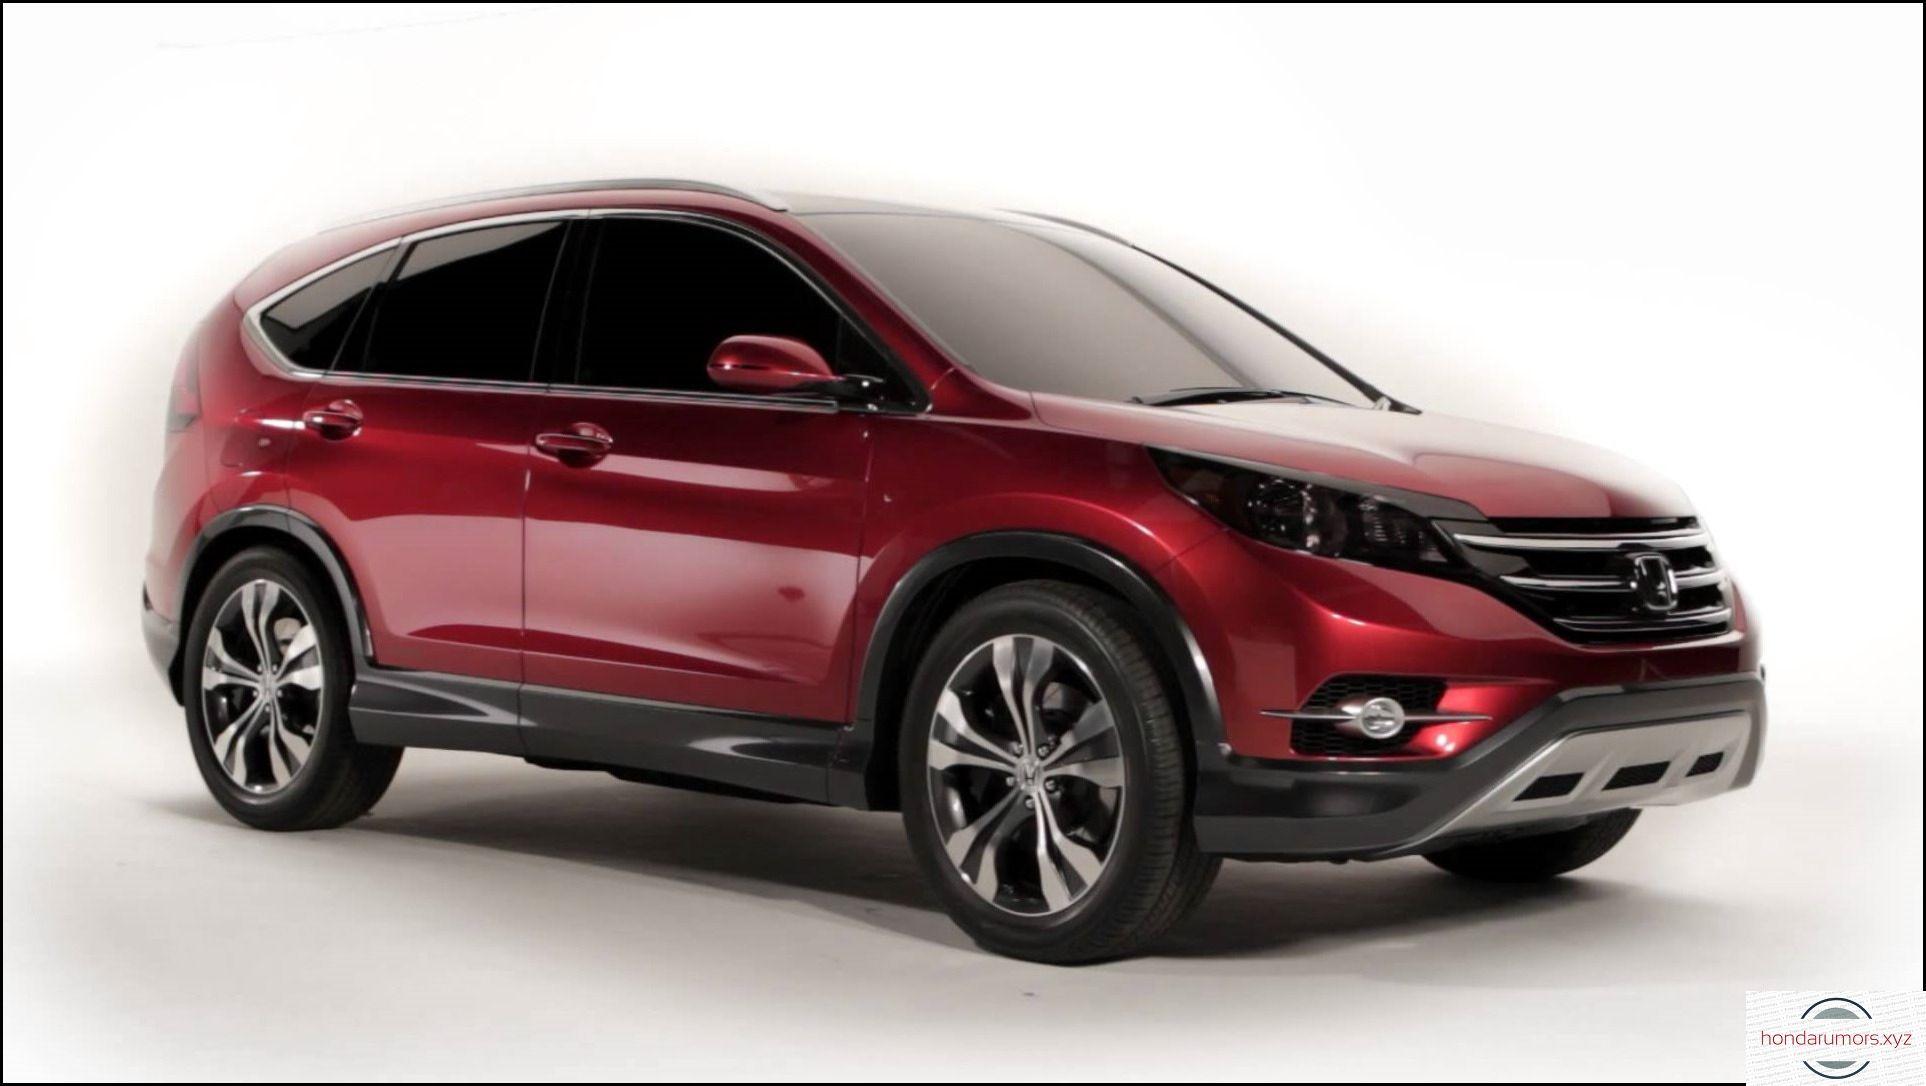 2020 honda hrv Honda hrv, Honda crv hybrid, Honda crv